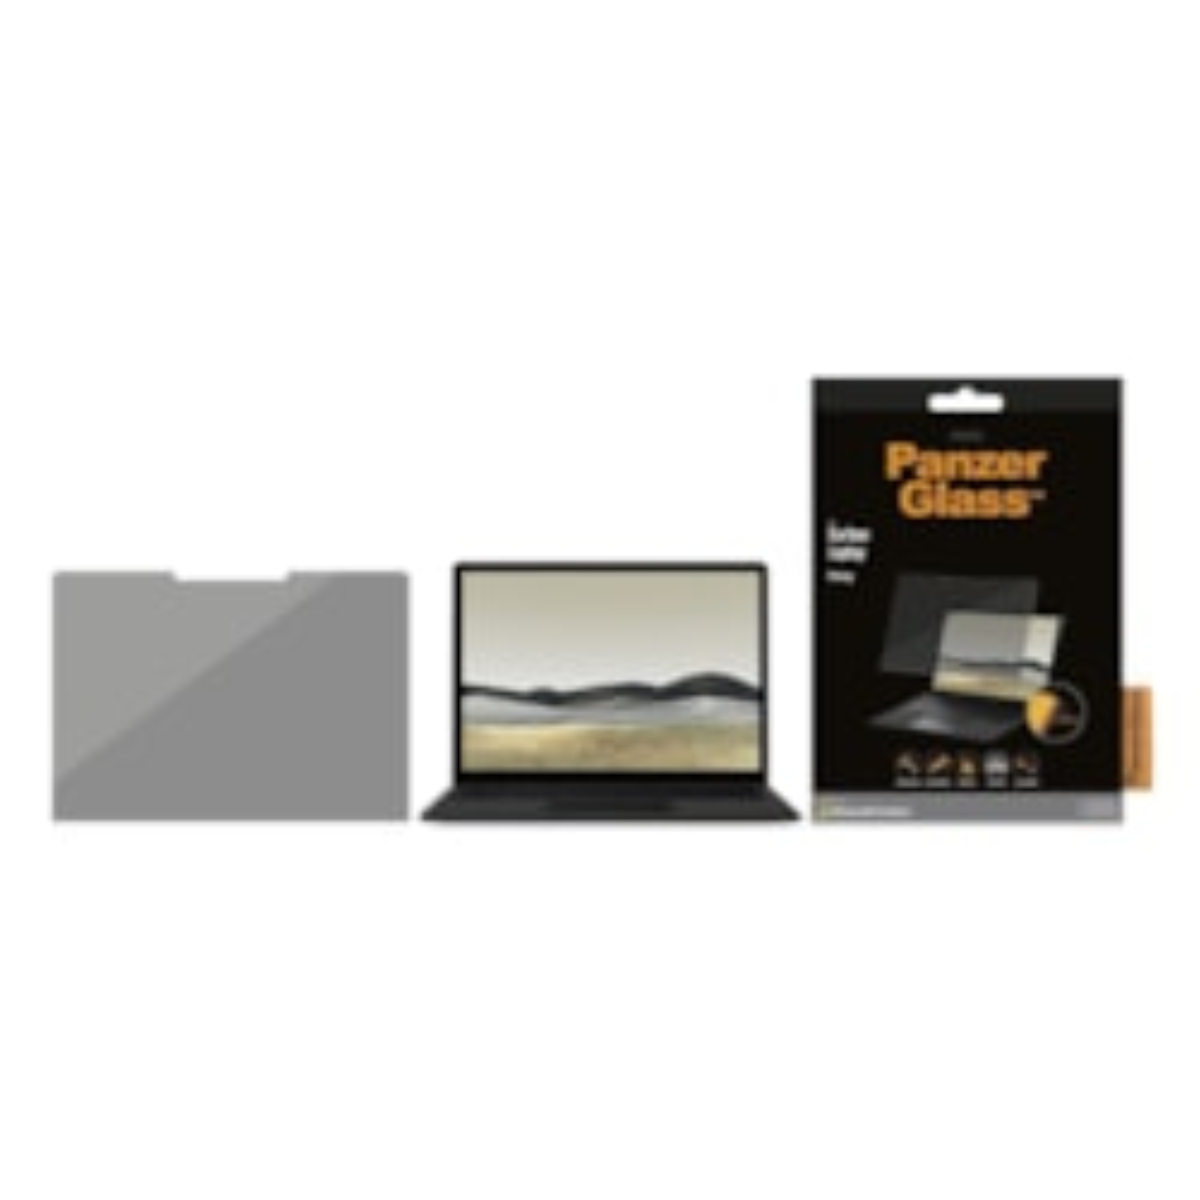 PanzerGlass Tempered Glass Privacy Screen Filter